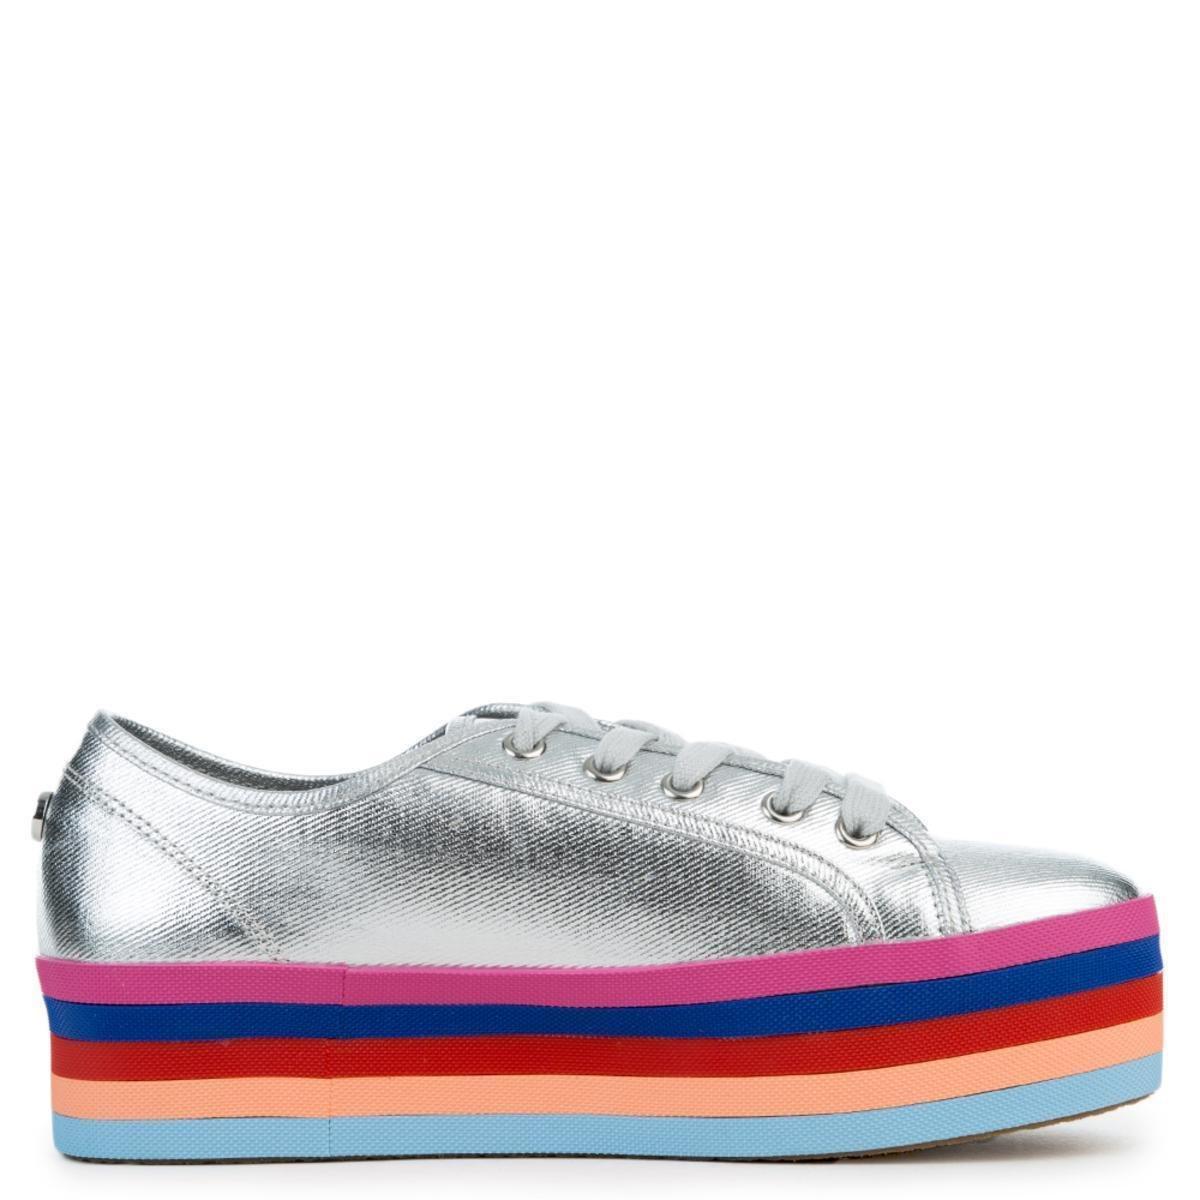 449607da269 Steve Madden - Metallic Rainbow 751 Silver Platform Sneaker - Lyst. View  fullscreen